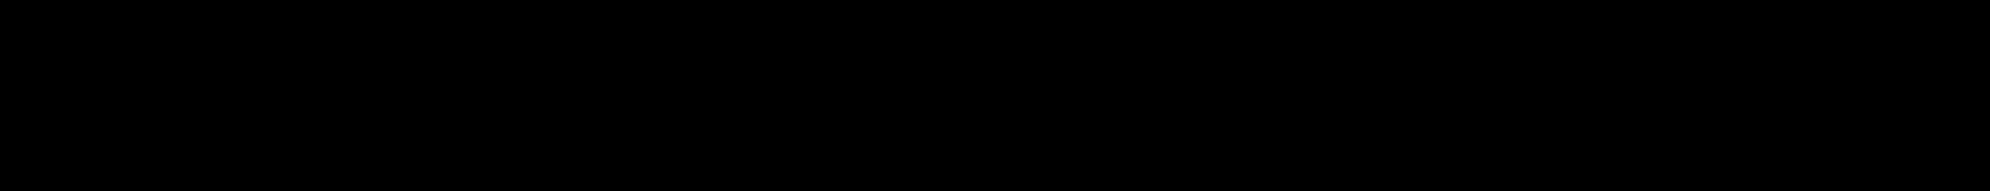 Luella Basic Frames A